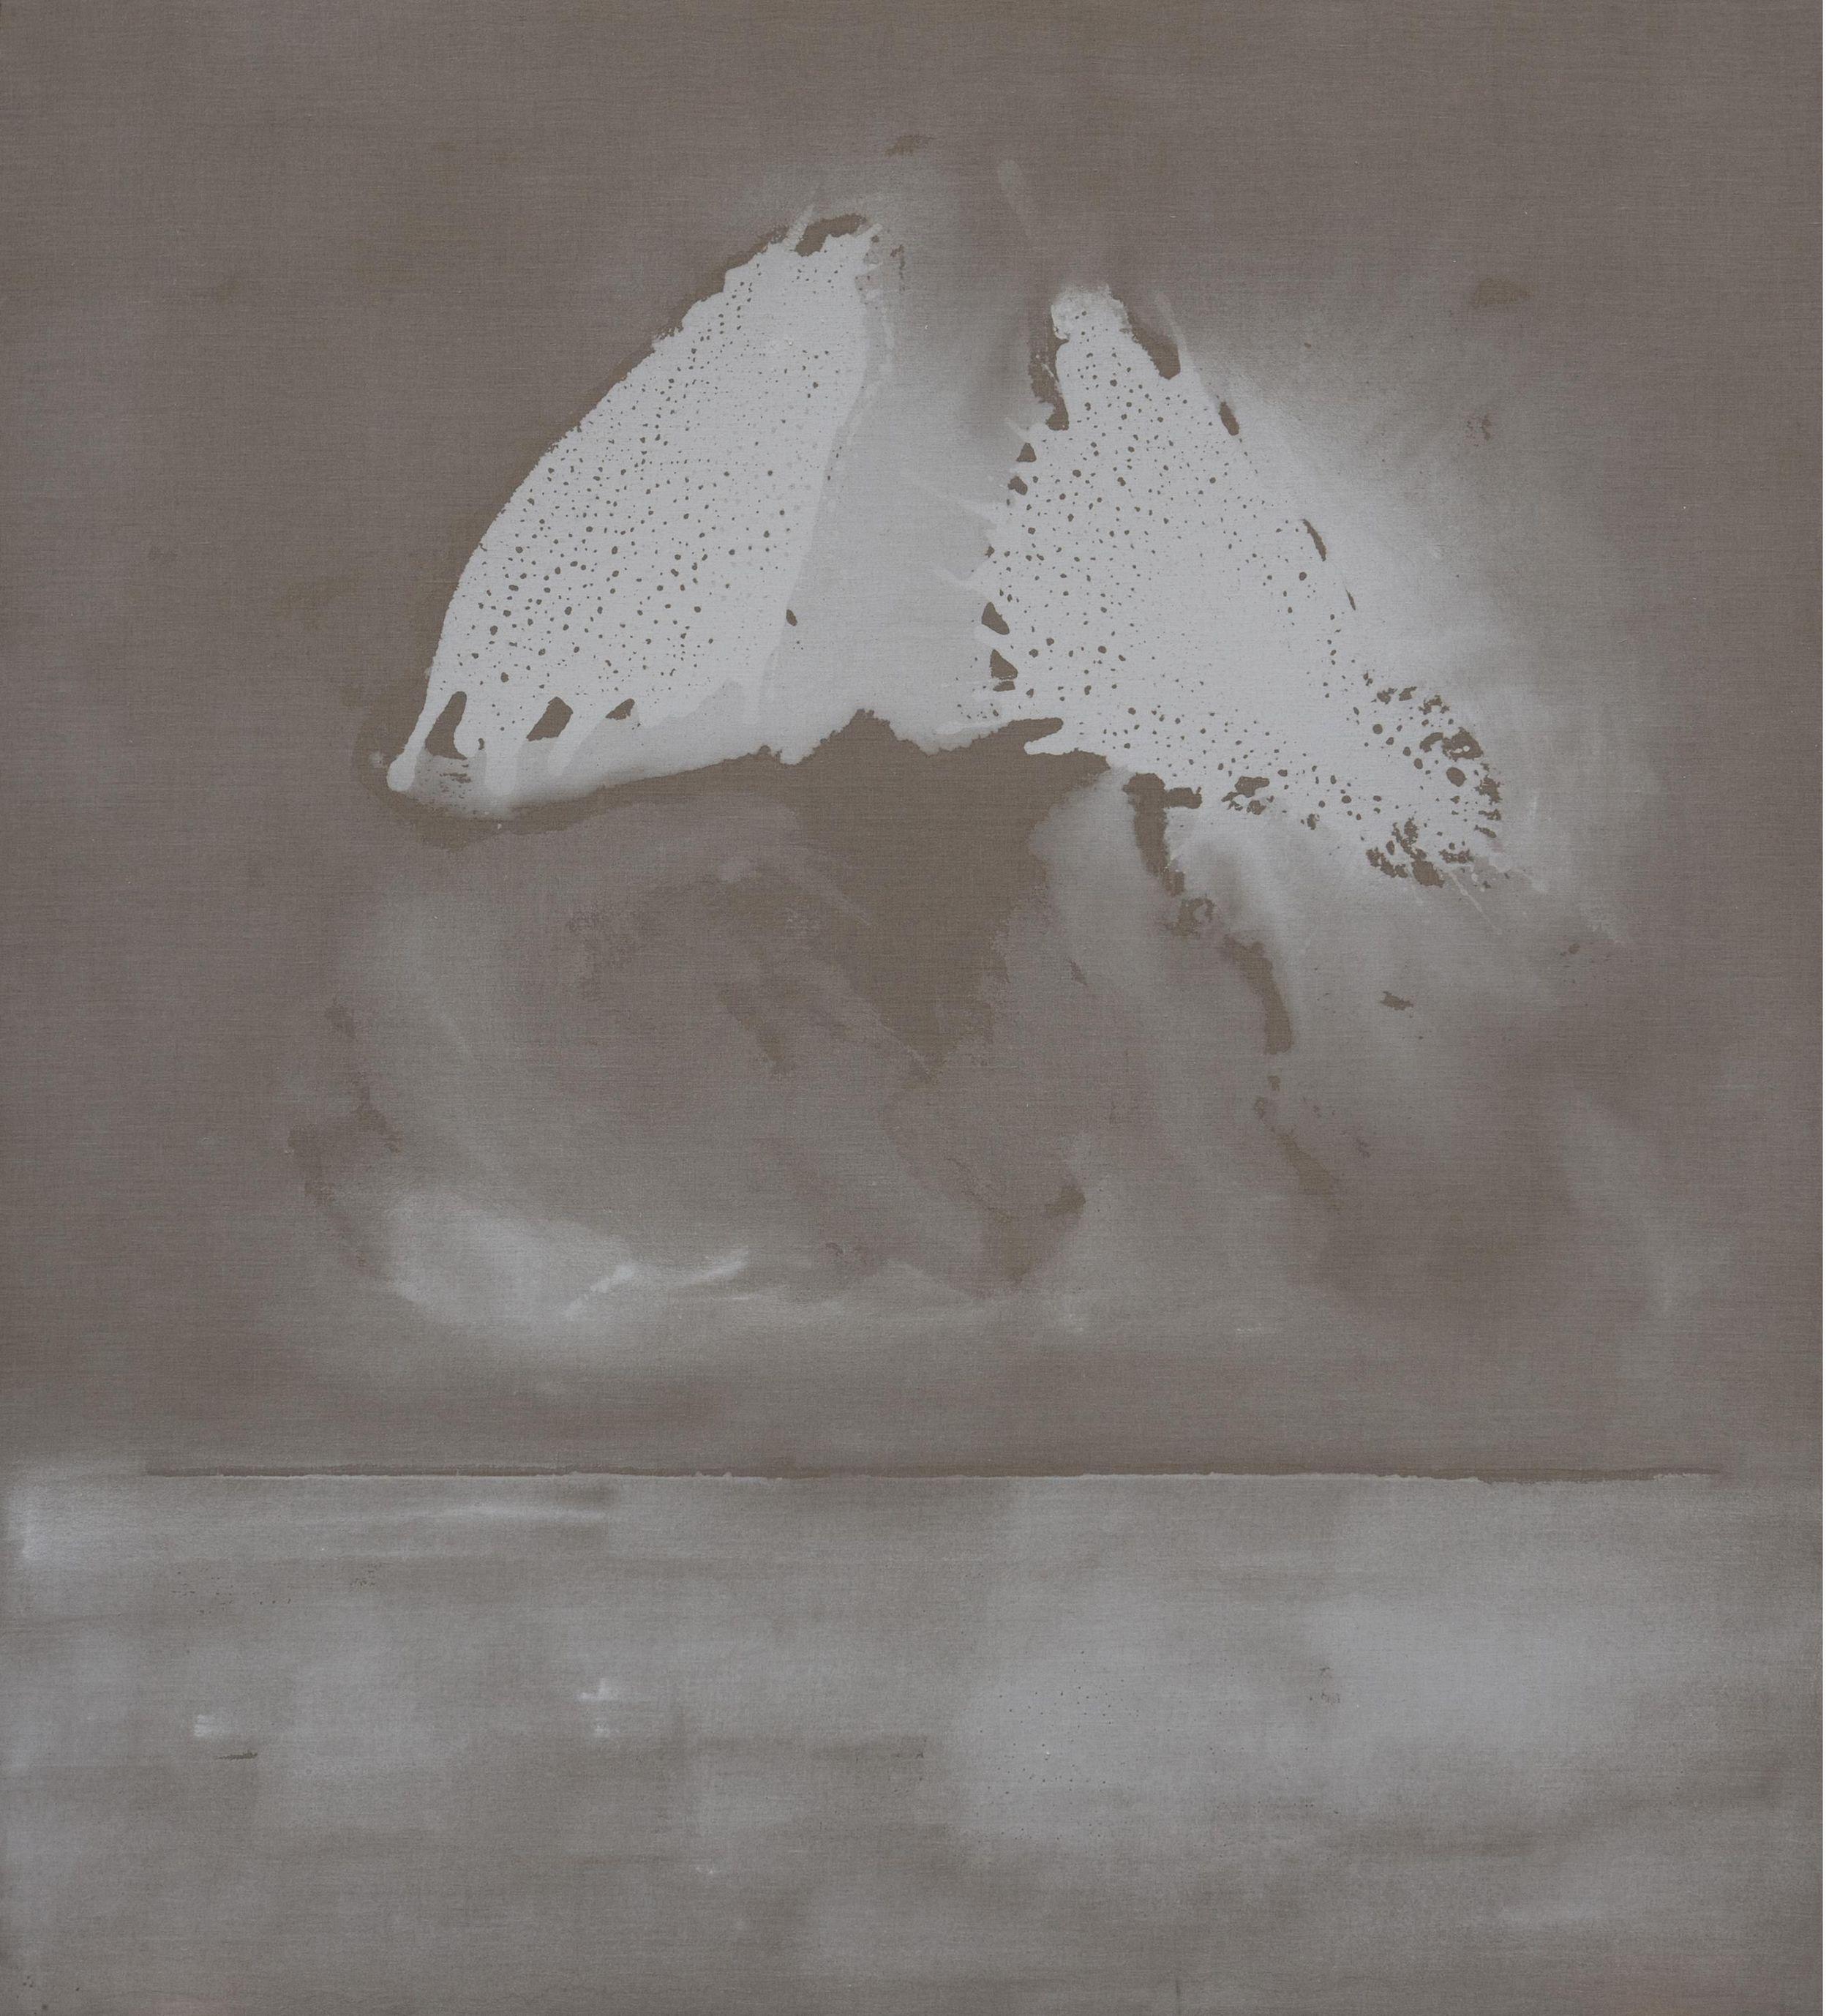 22 aprile, 2004, tempera acrilica su tela, cm 200 x 180  22 aprile, 2004, acrylic tempera on canvas, cm 200 x 180